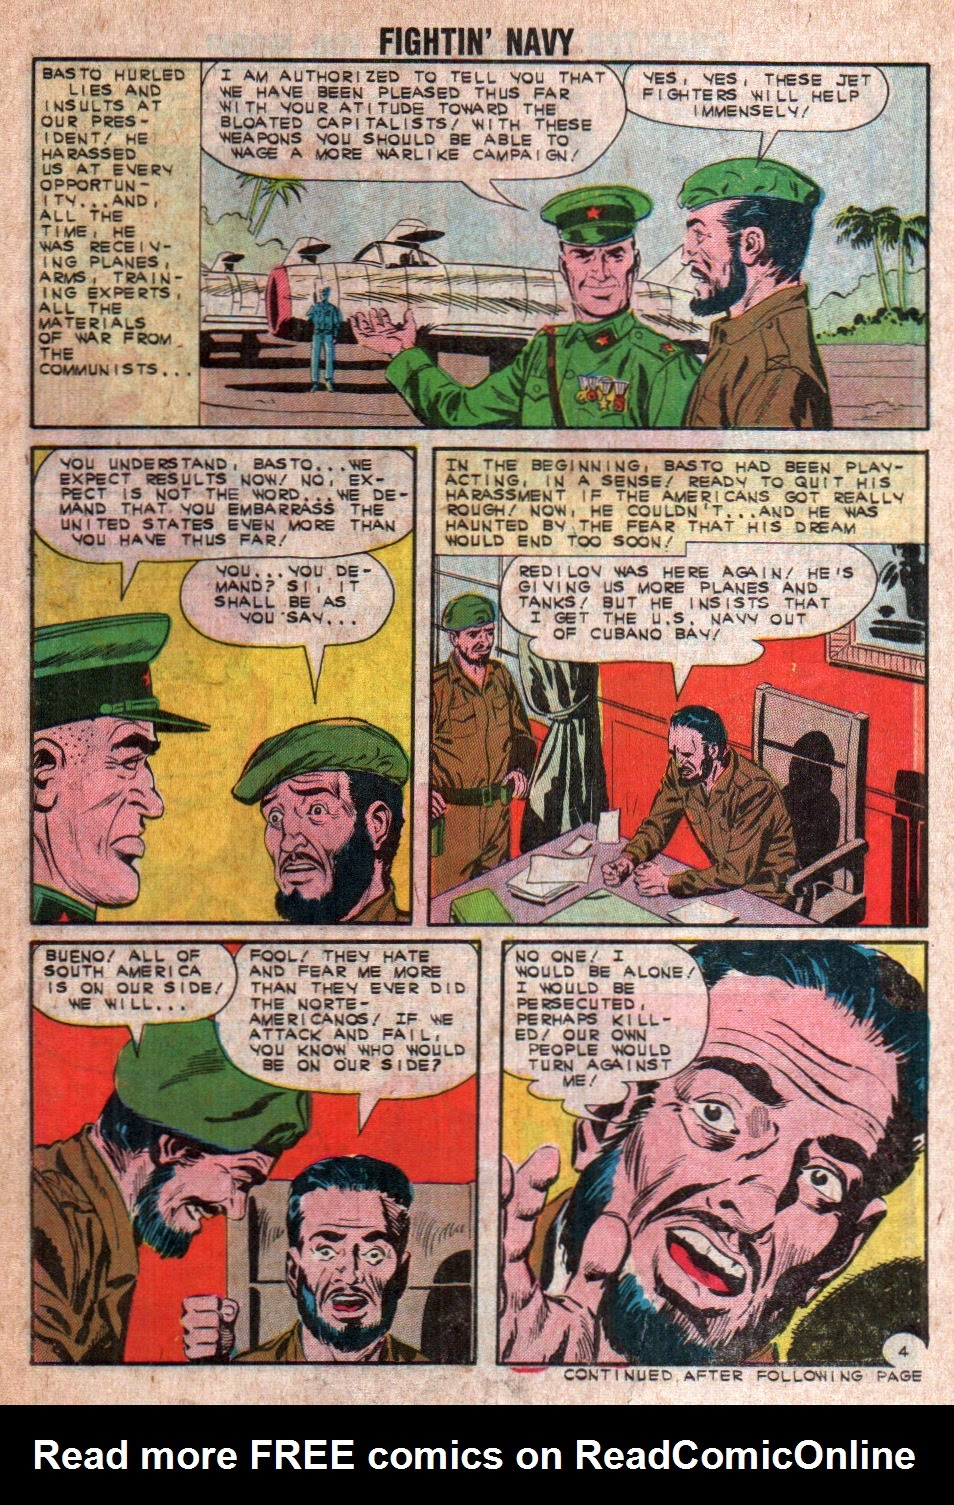 Read online Fightin' Navy comic -  Issue #108 - 14